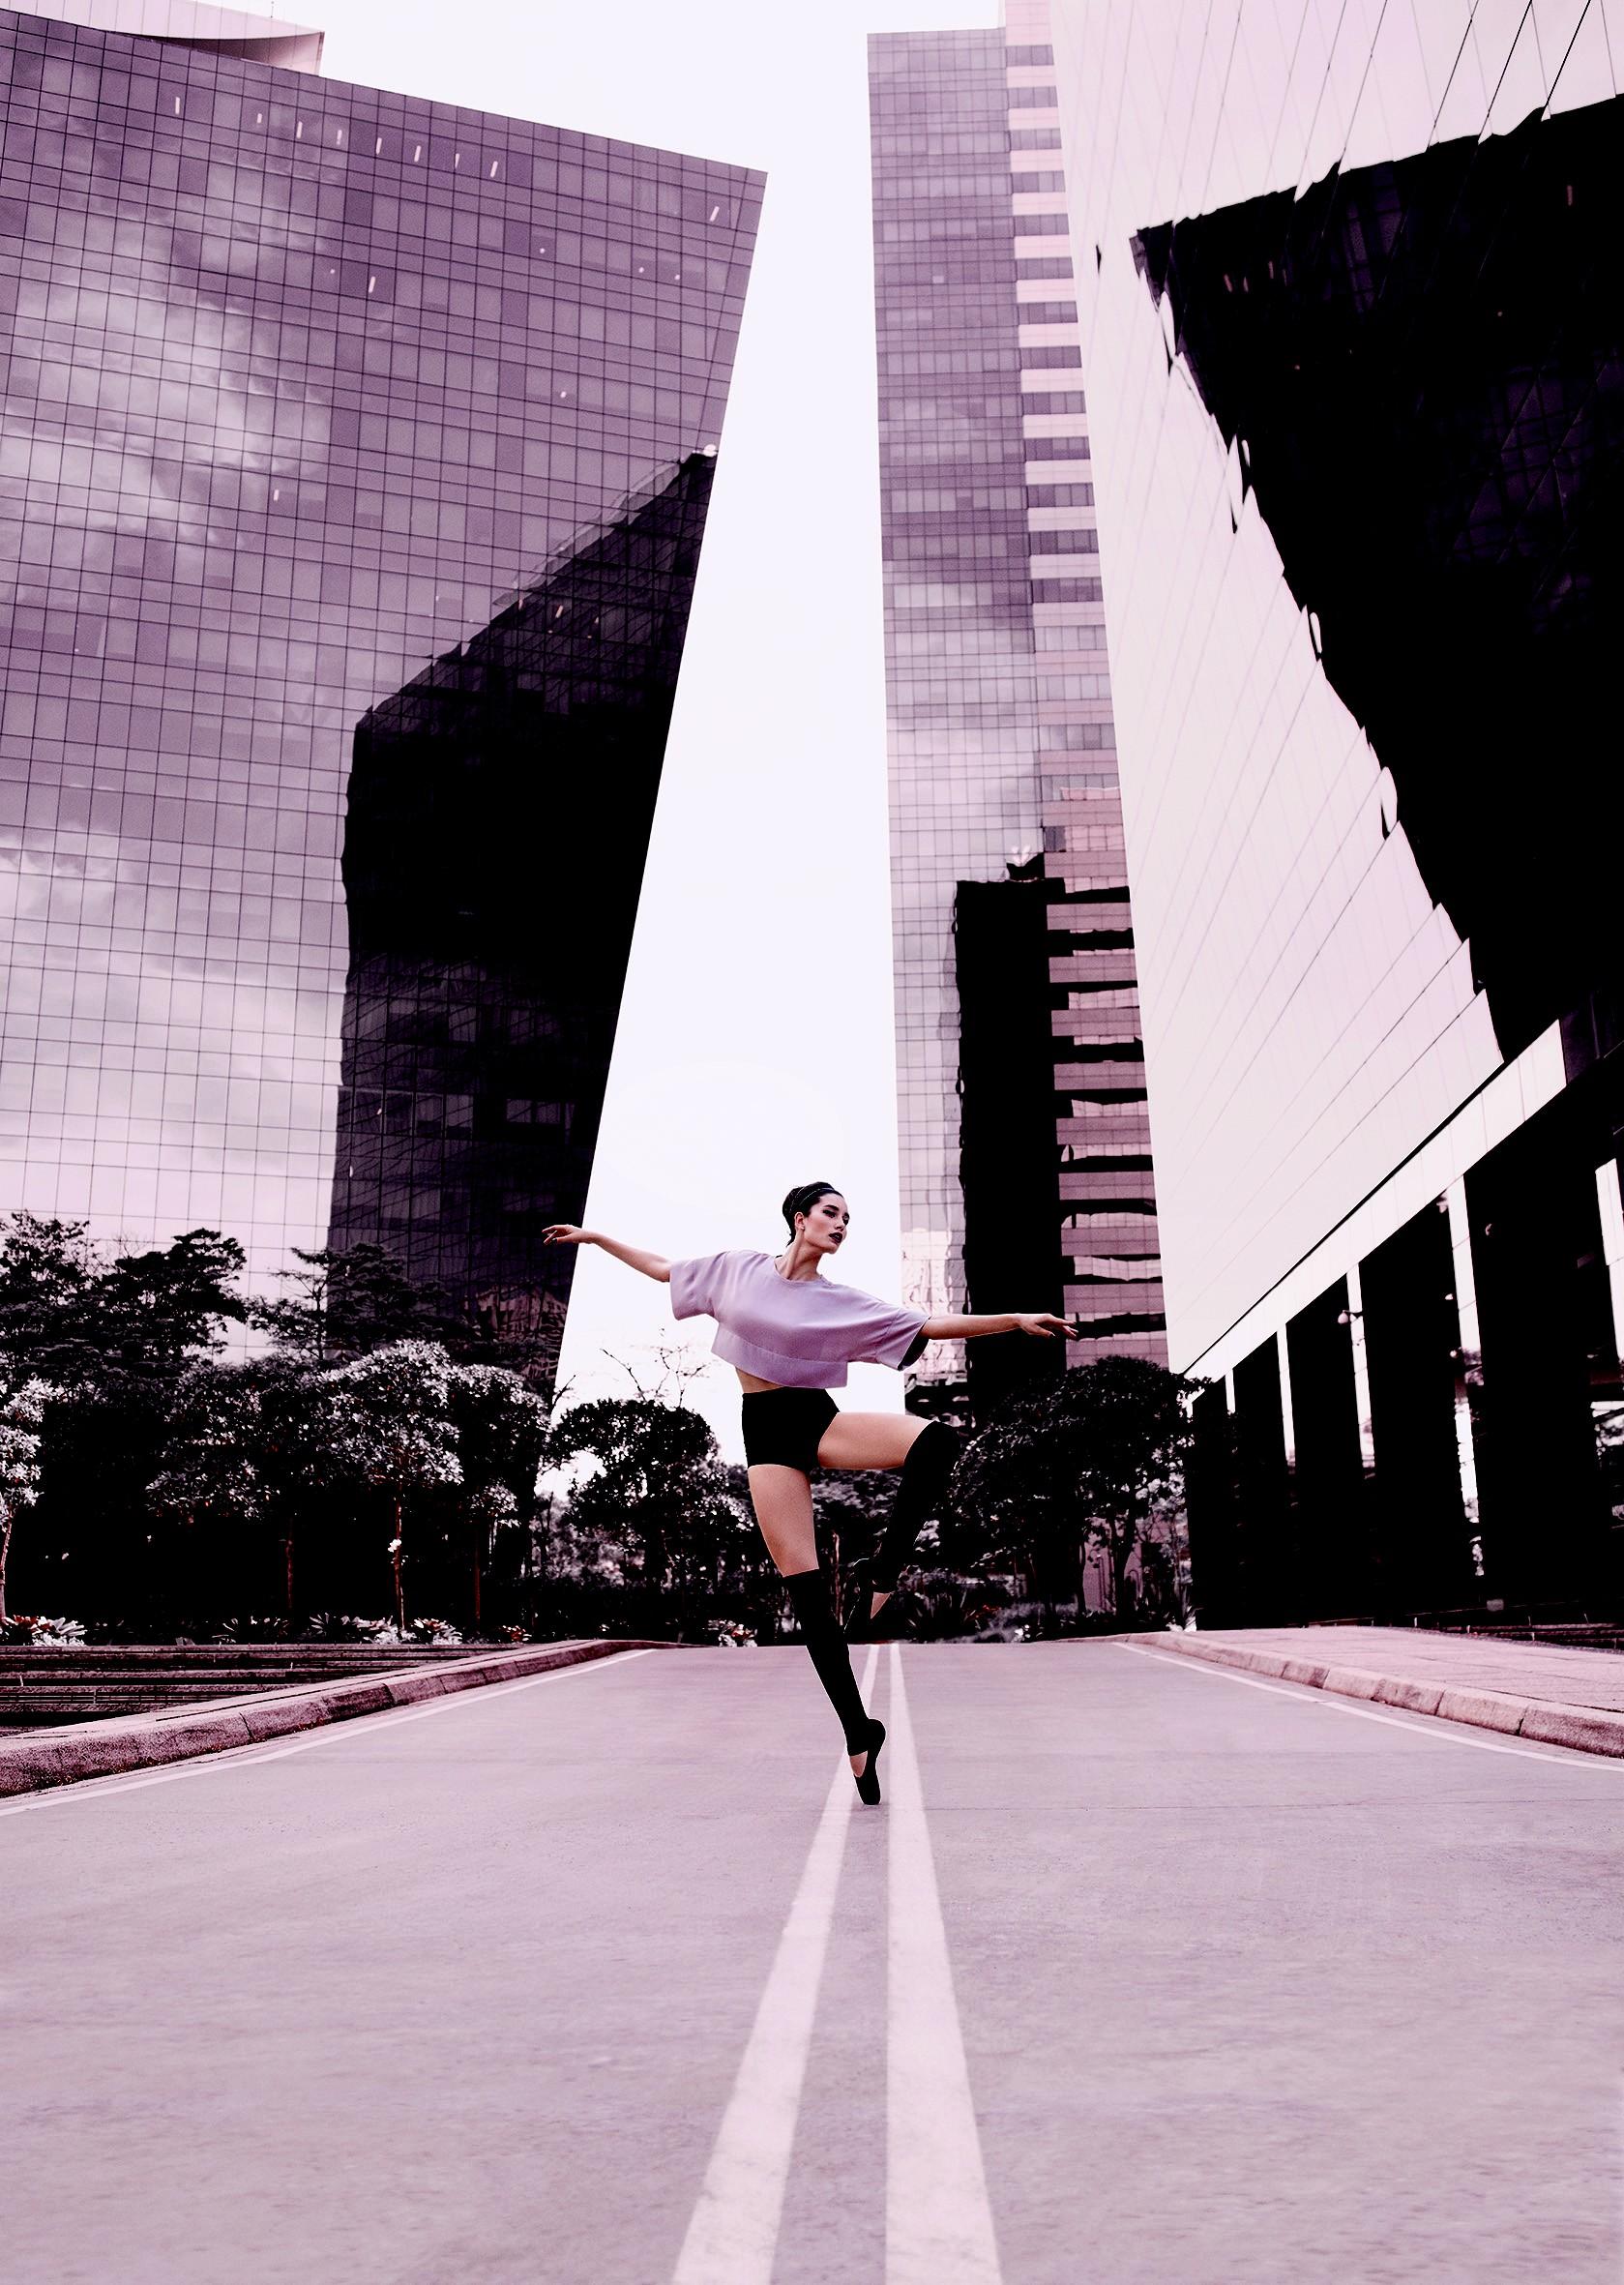 bt_16_04_urban_ballet_modelo_marcelia_ins